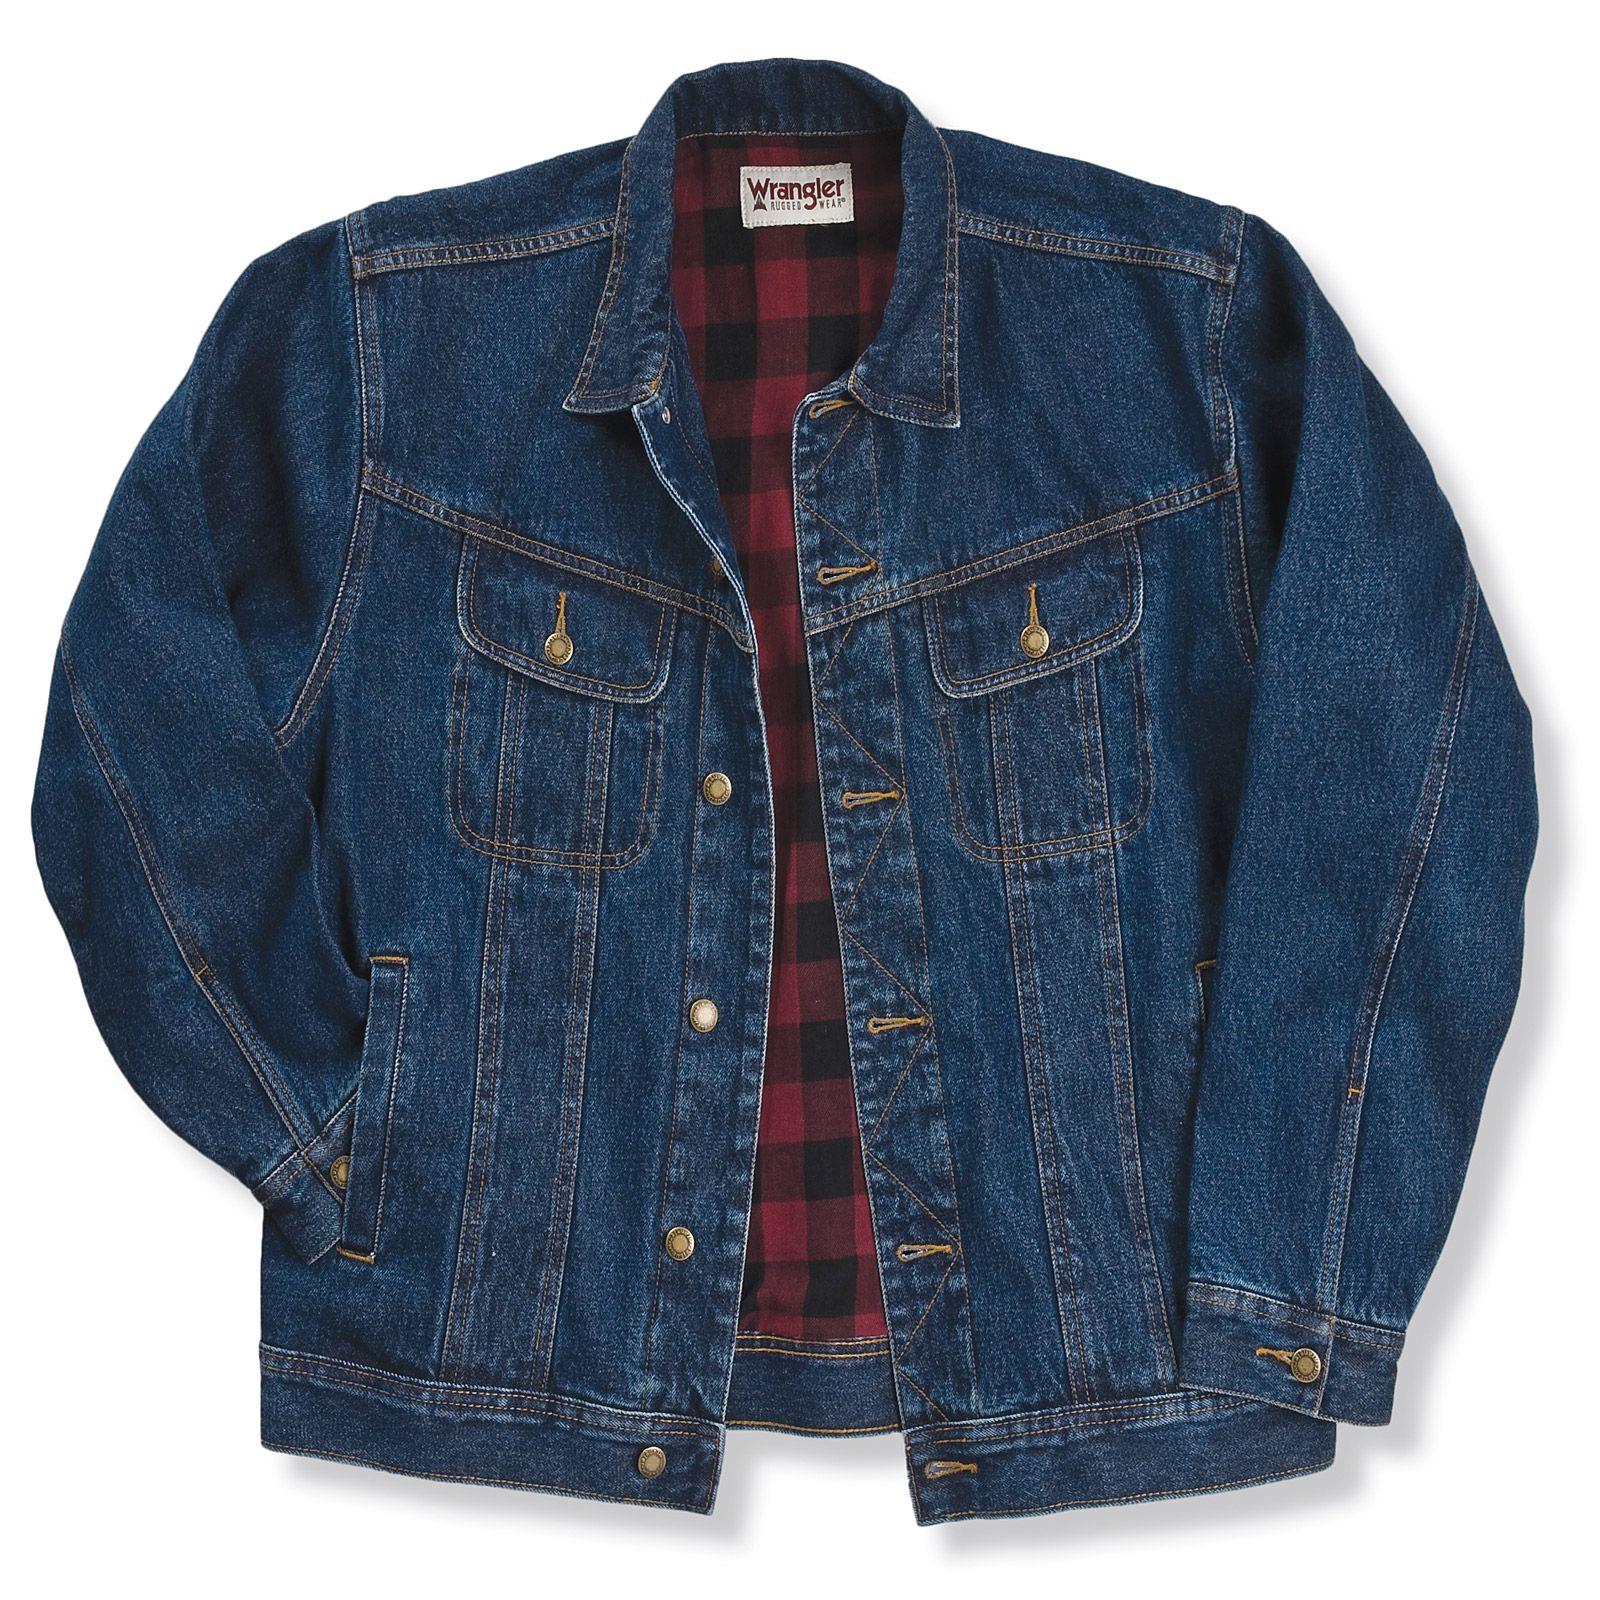 Wrangler Wrangler Rugged Wear Flannel Lined Denim Jacket Antique Navy Big Tall Lined Denim Jacket Mens Jackets Outerwear Jackets [ 1600 x 1600 Pixel ]